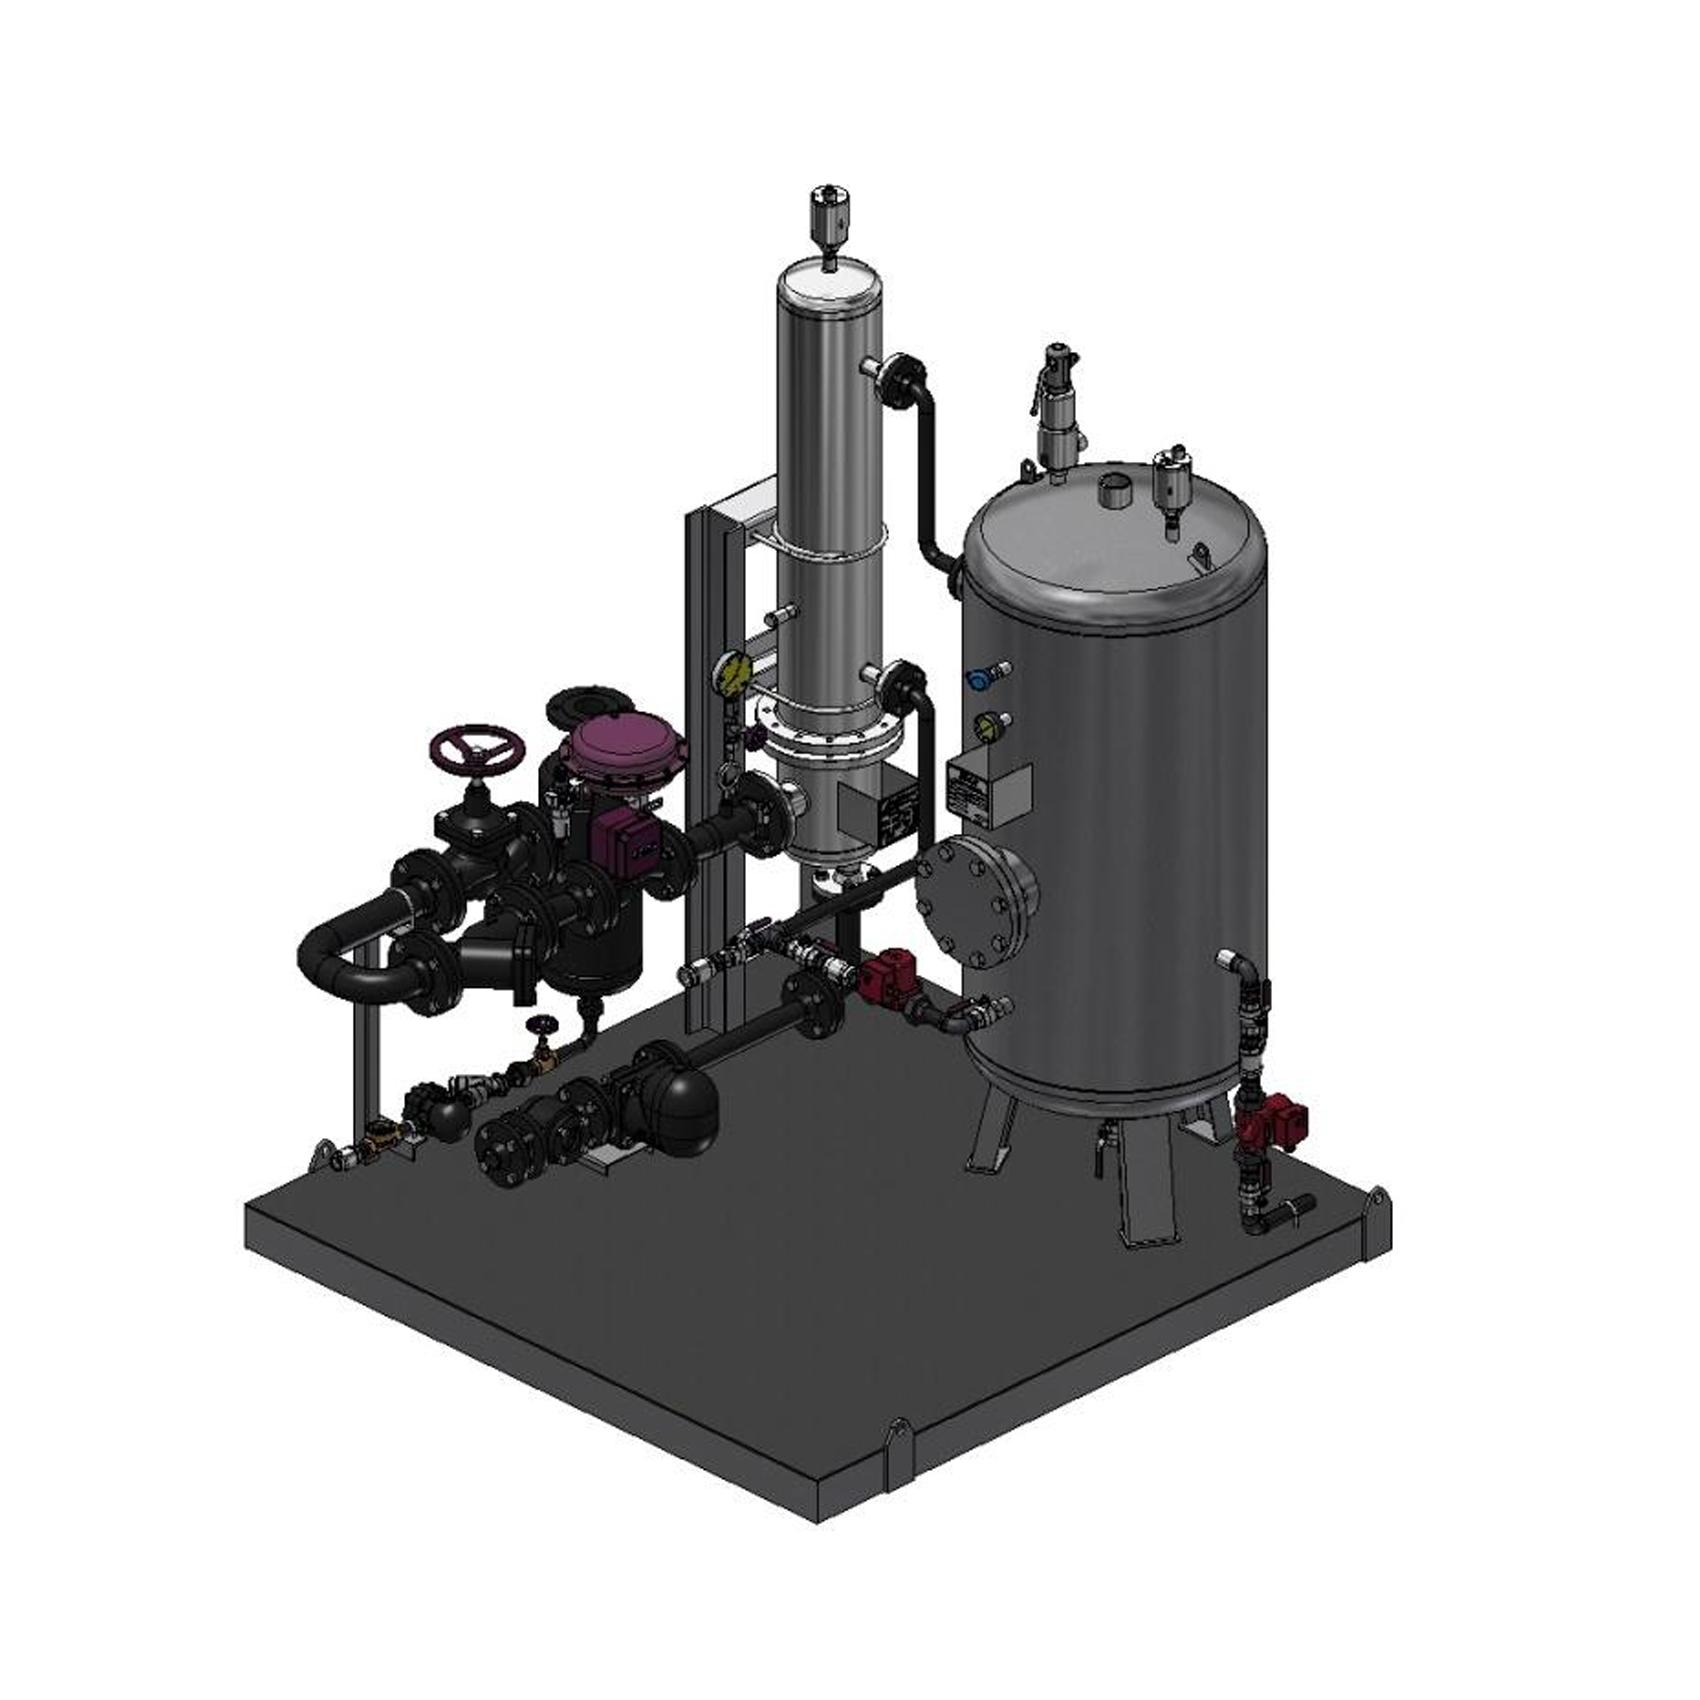 Резервуар для нагрева воды WAVE ADCA Прима Трейдинг Prima Trading